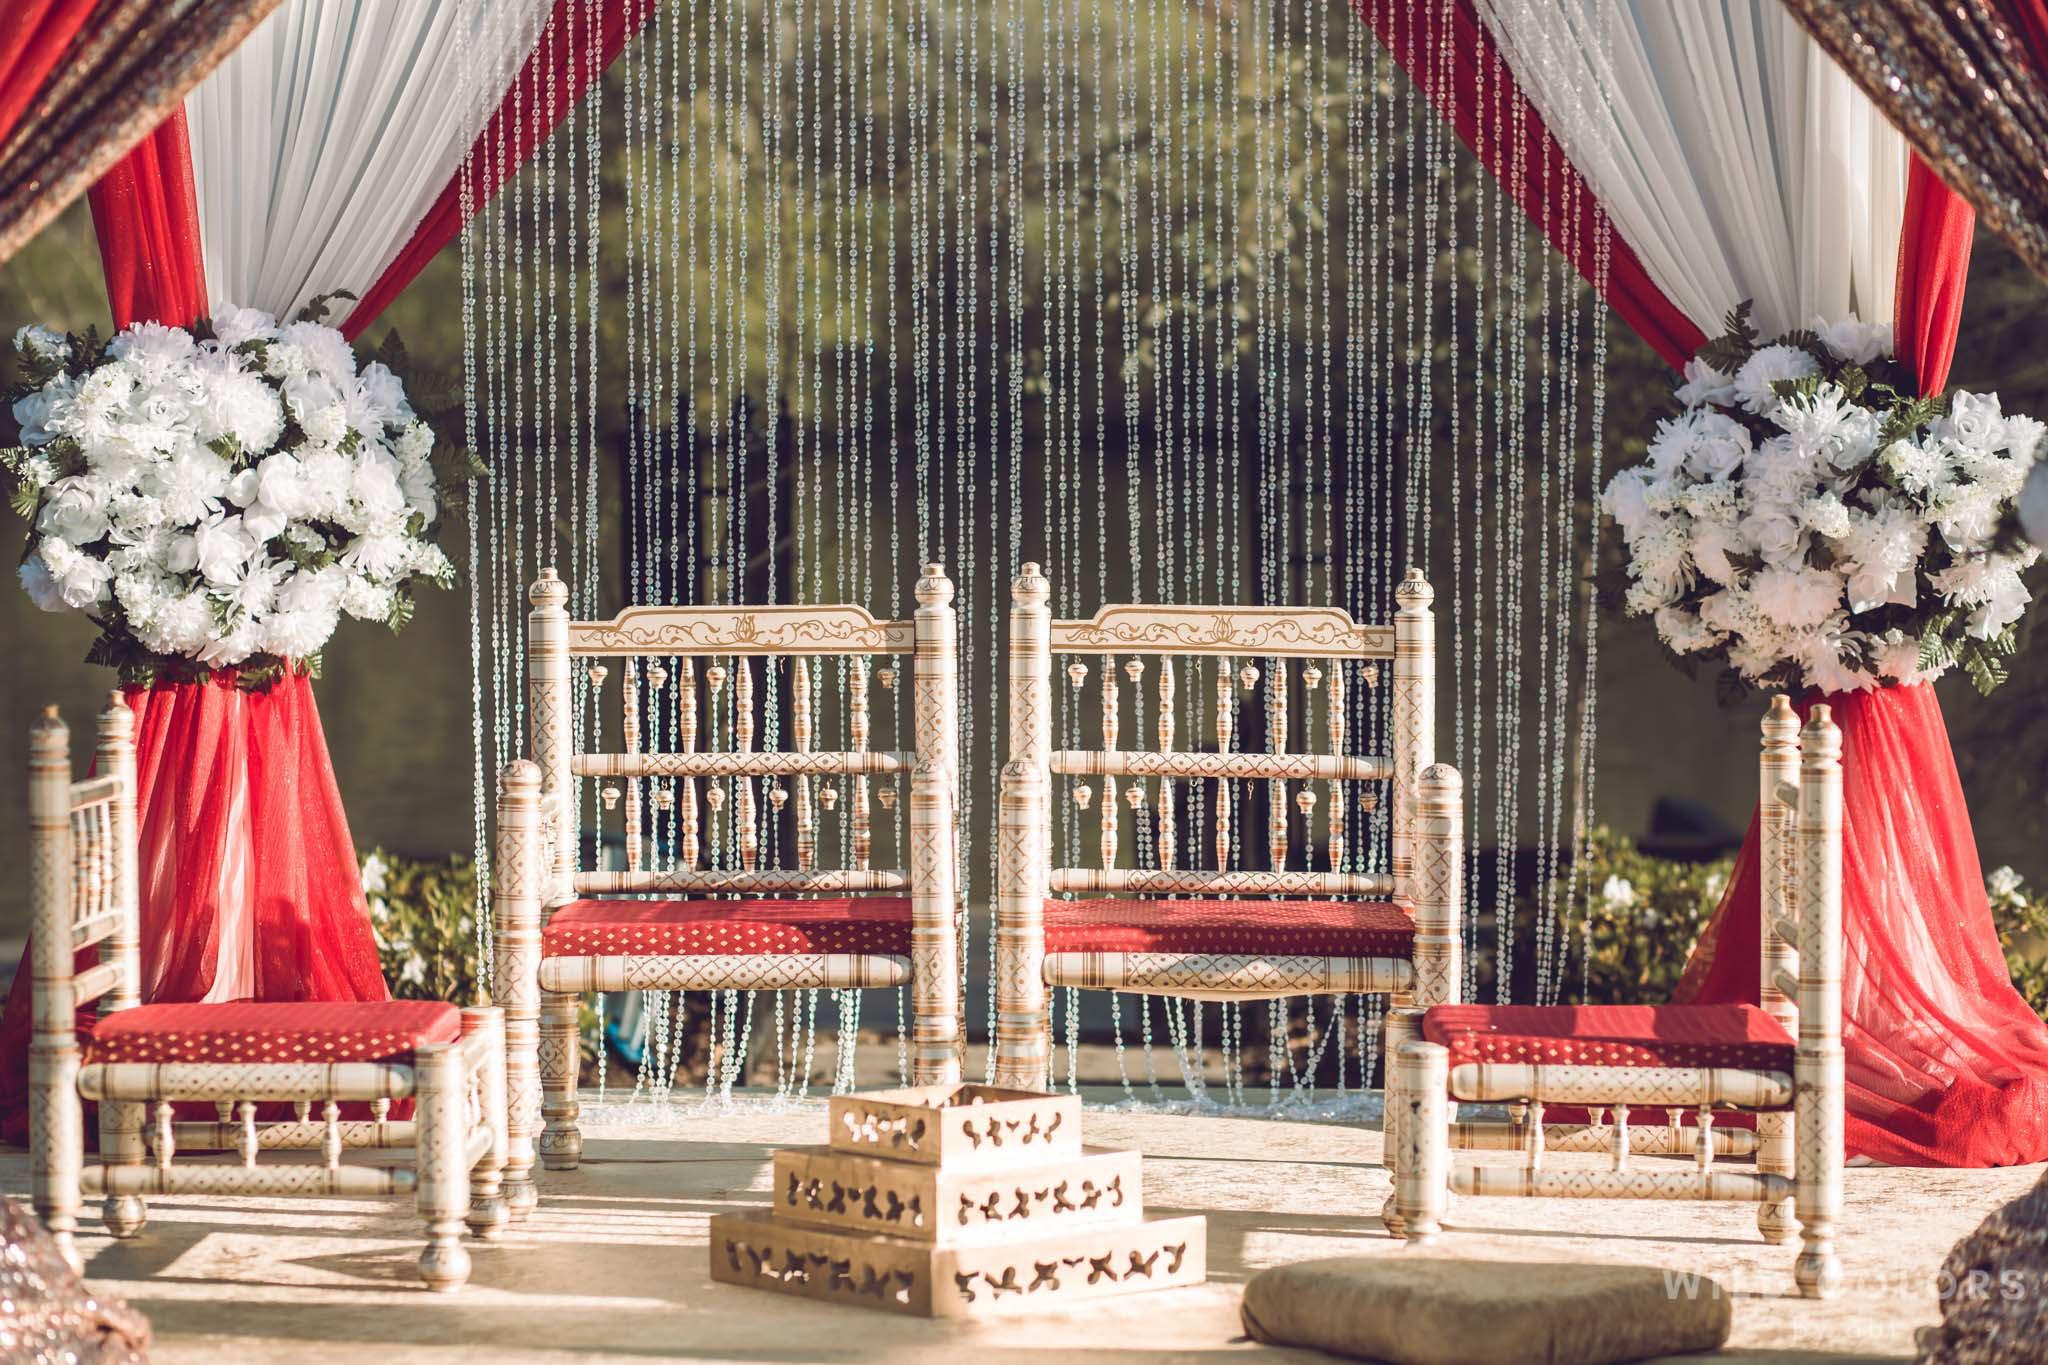 CANDID_INDIAN_WEDDING_ATLANTA_PHOTOGRAPHER-8.JPG